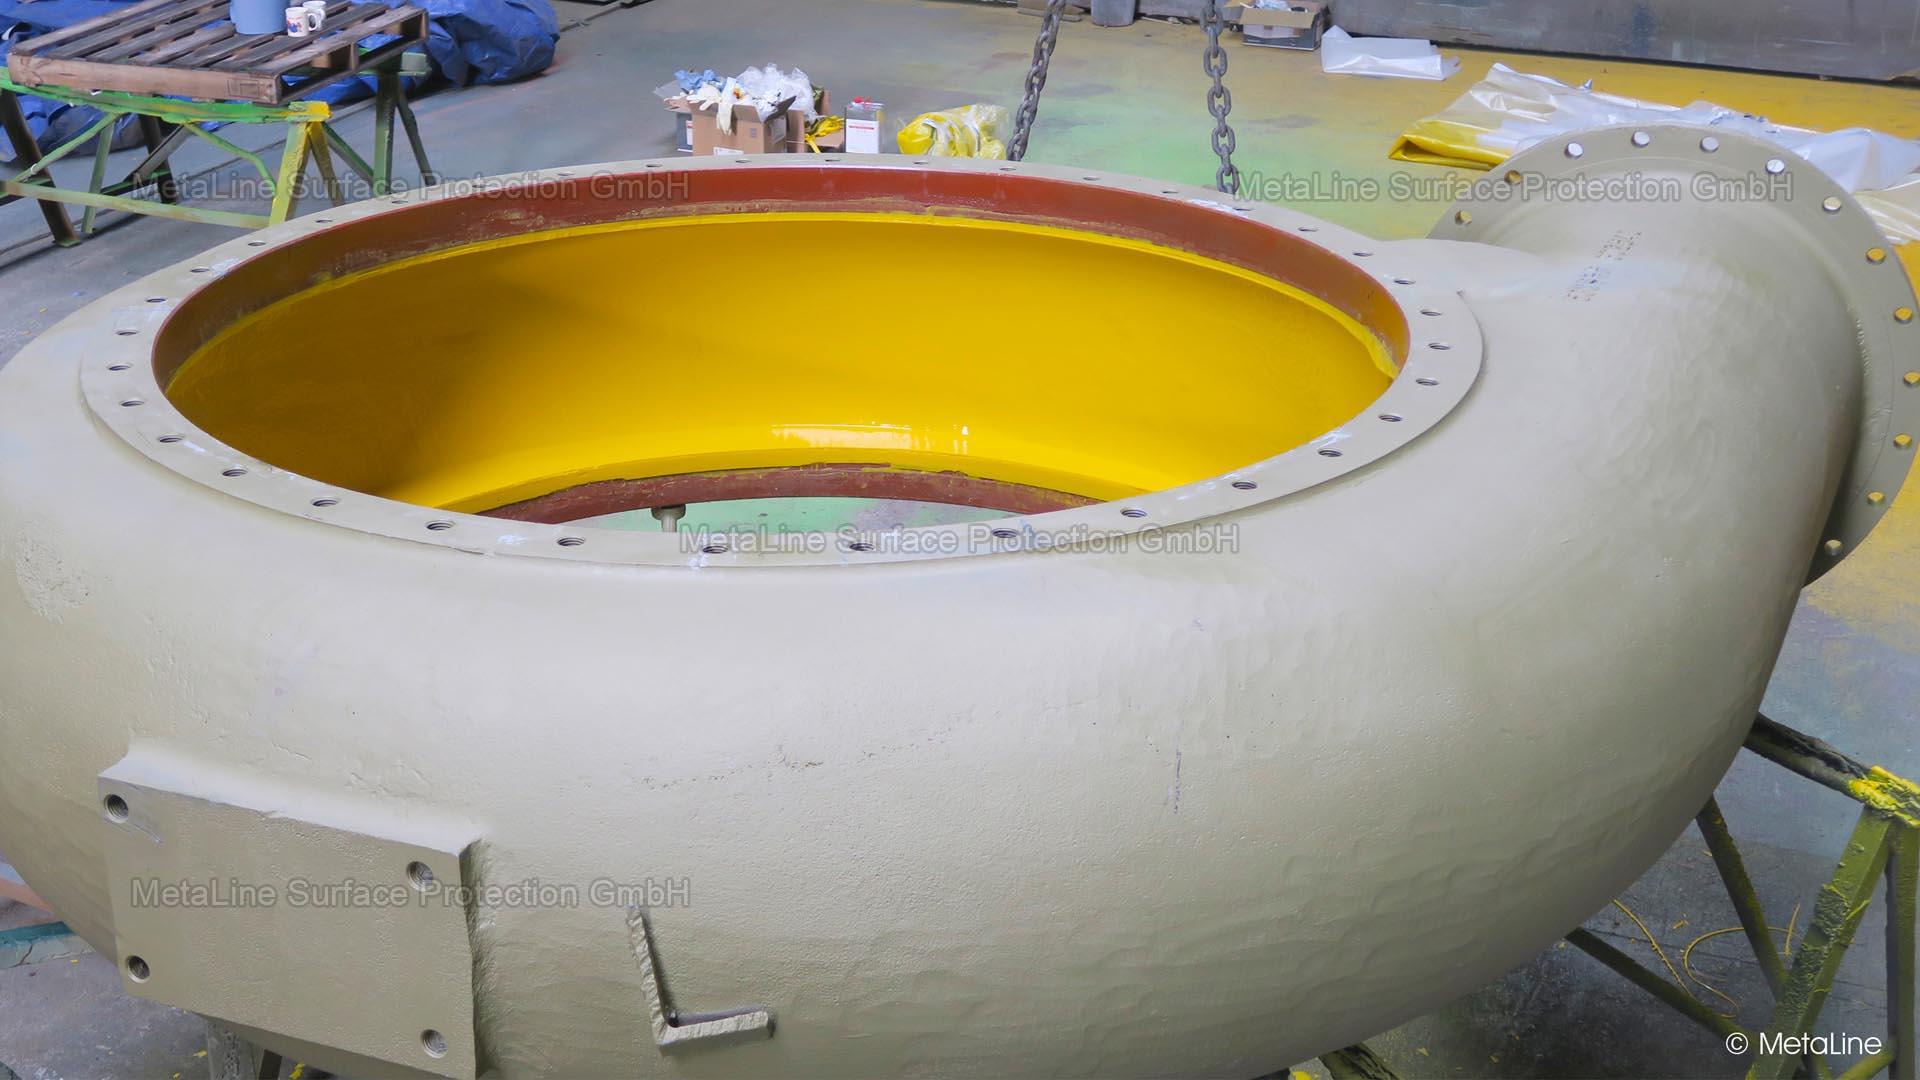 MetaLine | erosion resistant coatings for pump casings